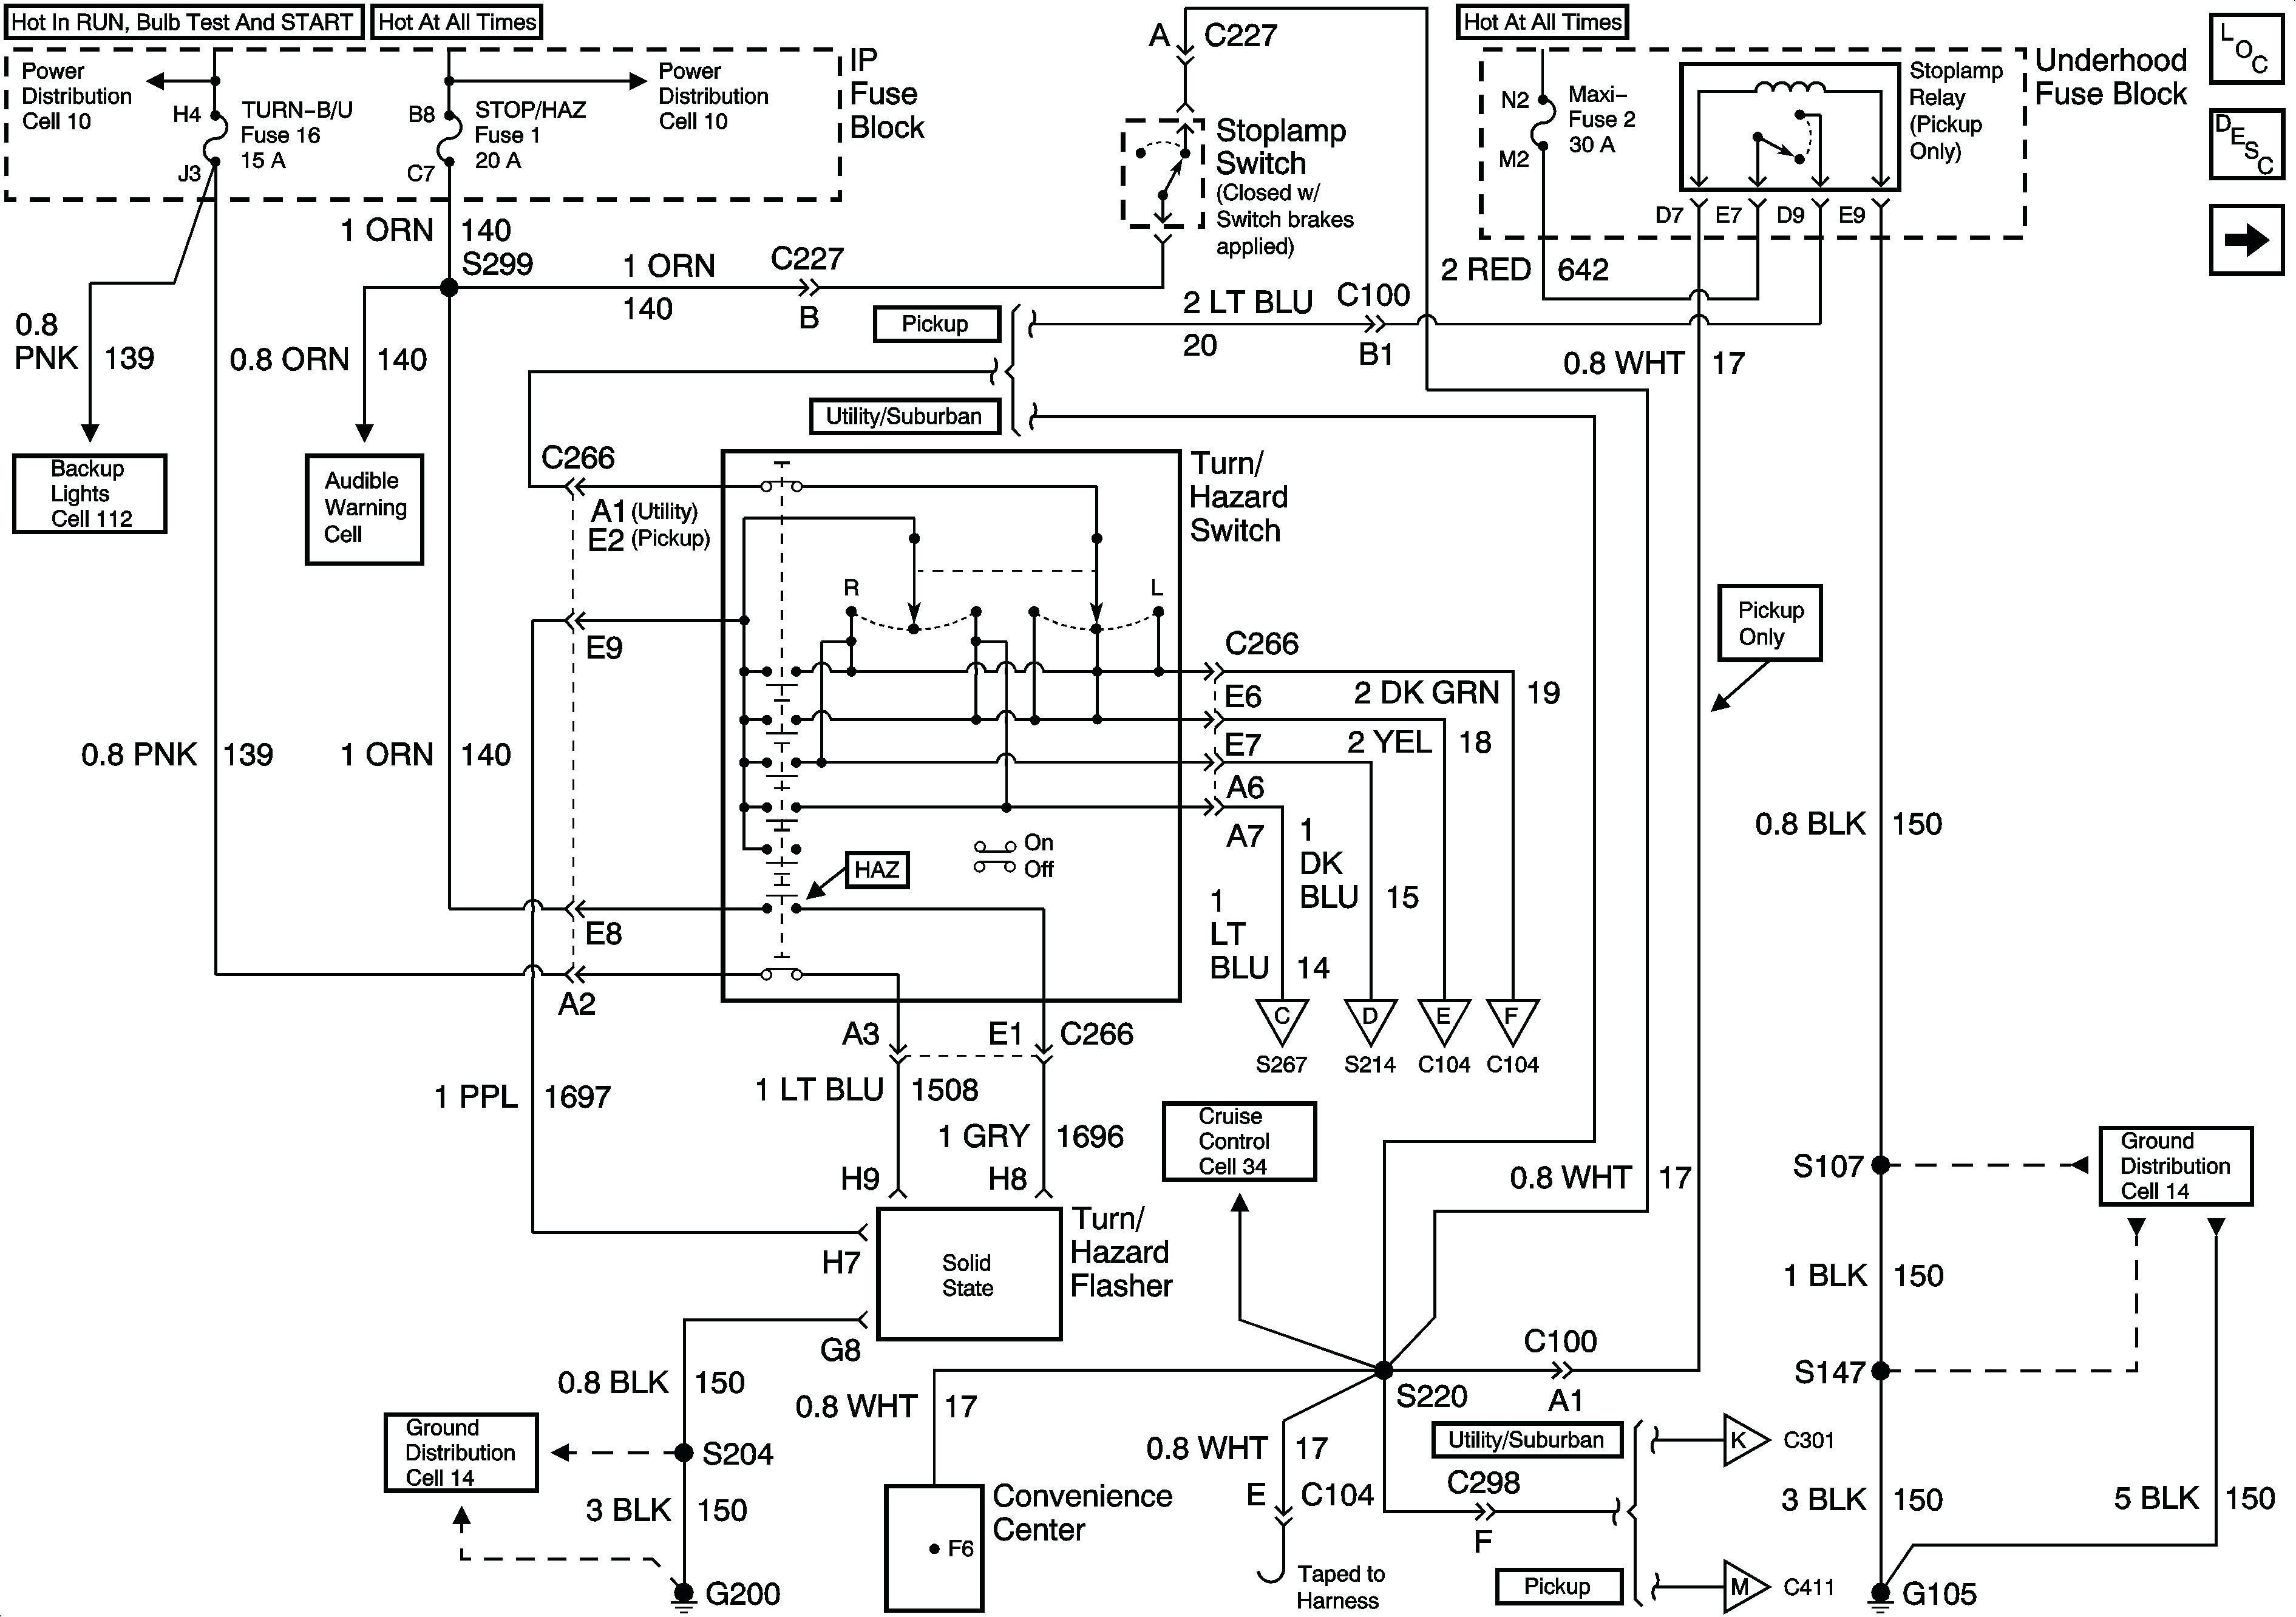 2000 Chevy Silverado Parts Diagram 2000 Silverado Horn Wiring Diagram Free Picture Opinions About Of 2000 Chevy Silverado Parts Diagram